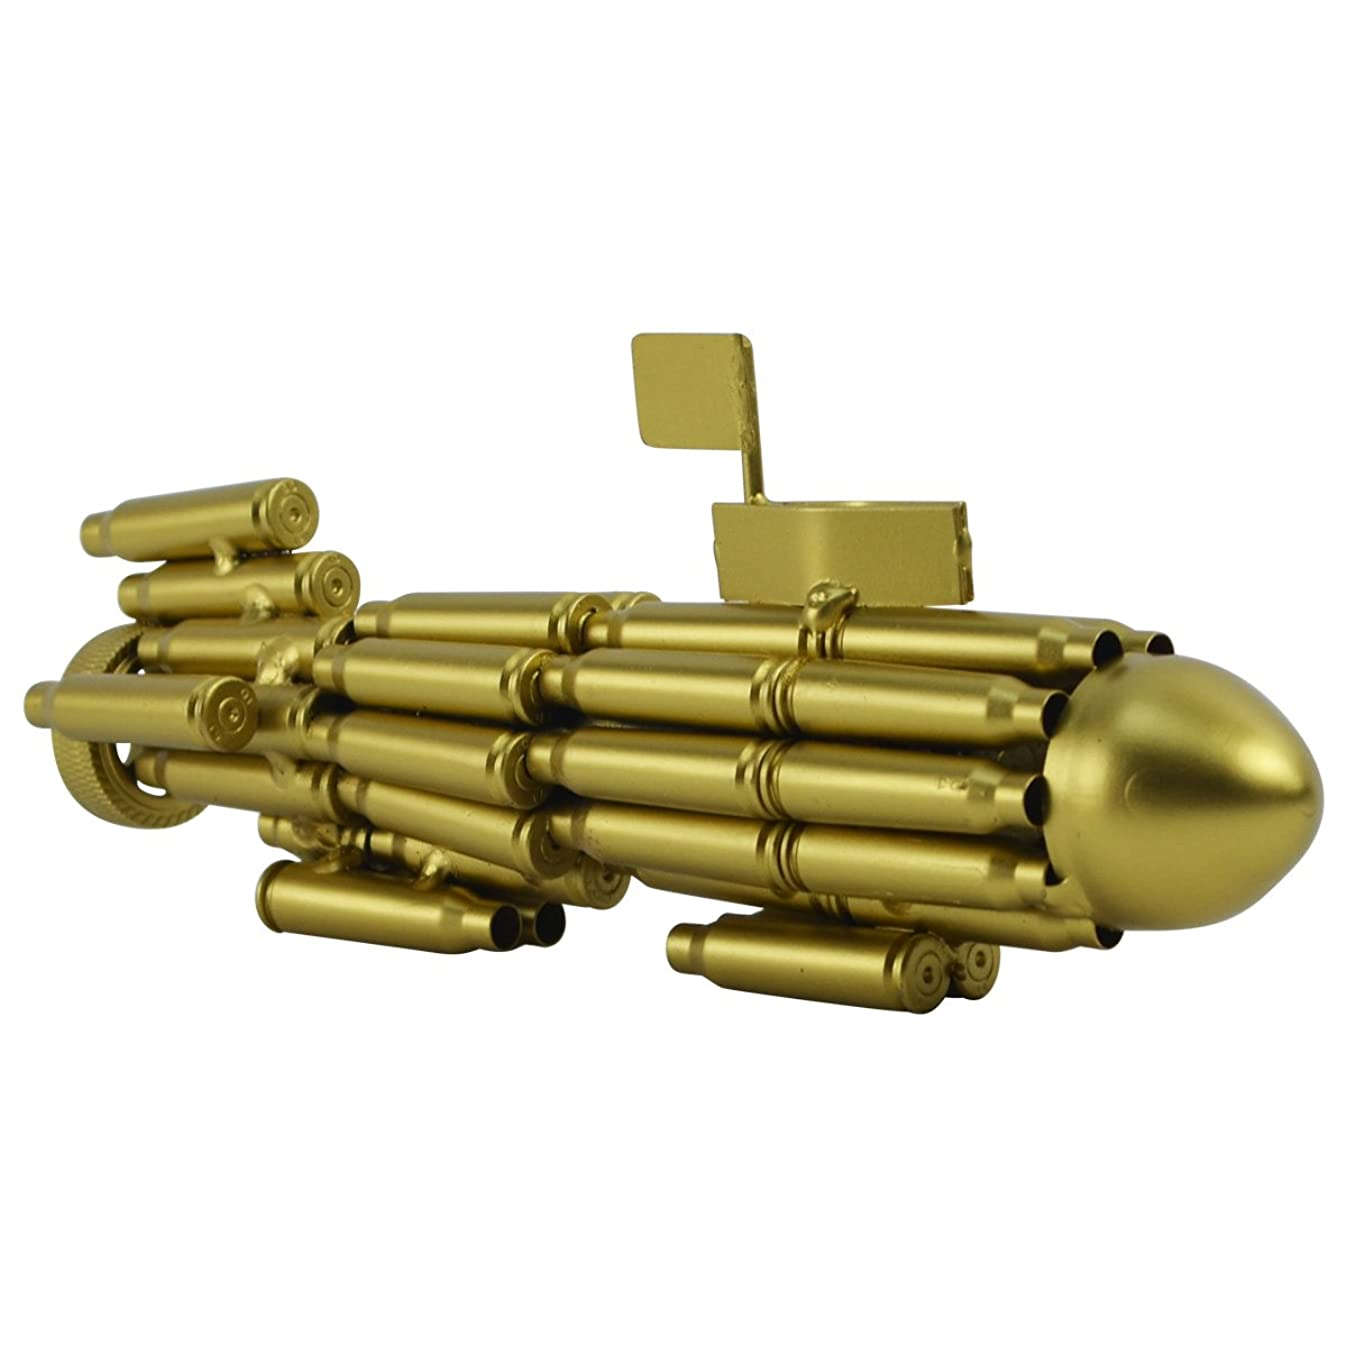 Gun Bullet Casings Shells Shaped Model Navy Diving Sub Submarine Military Gift